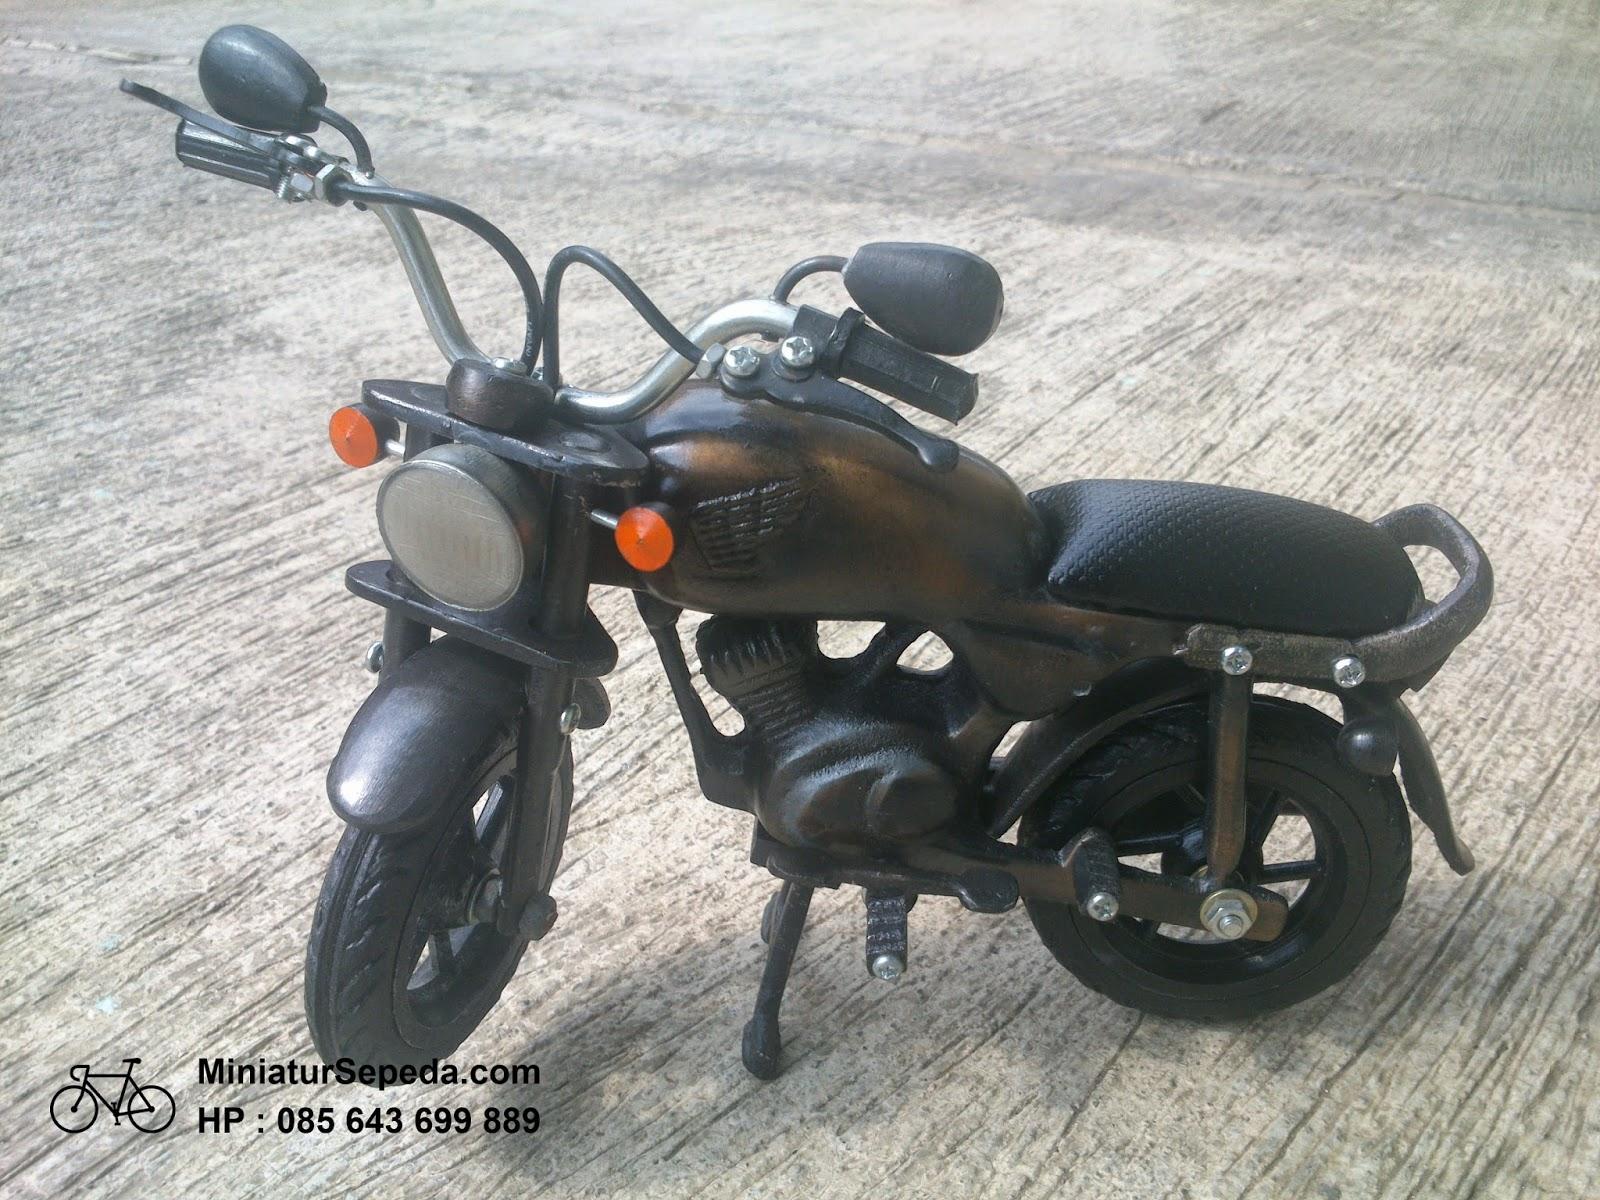 Miniatur Sepeda Motor CB